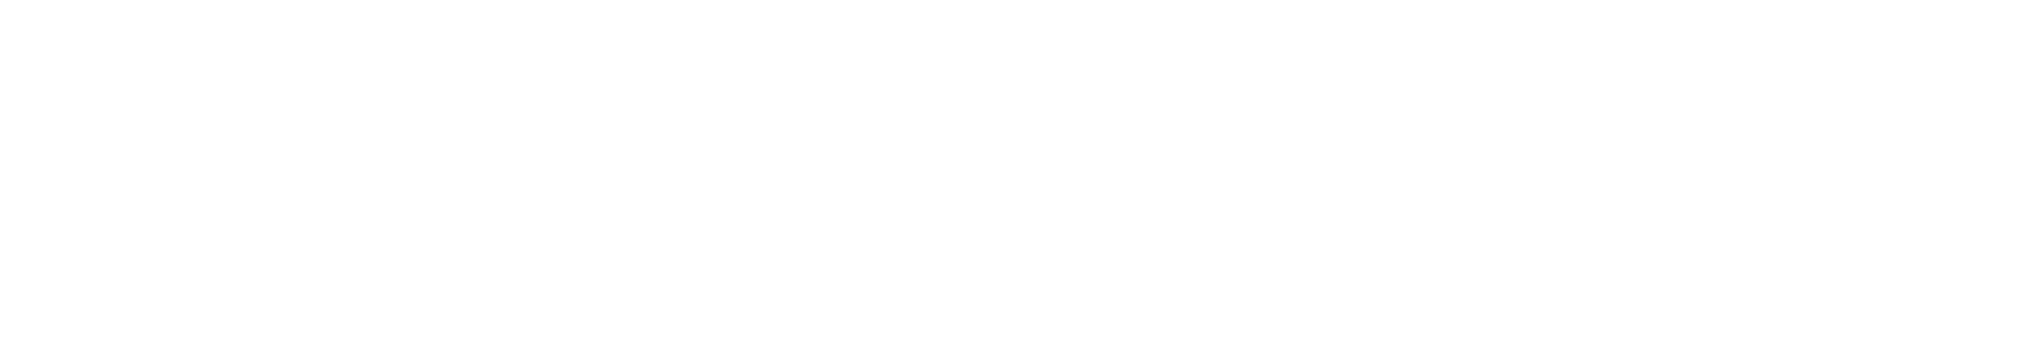 Ryotaro Horiuchi Official Website